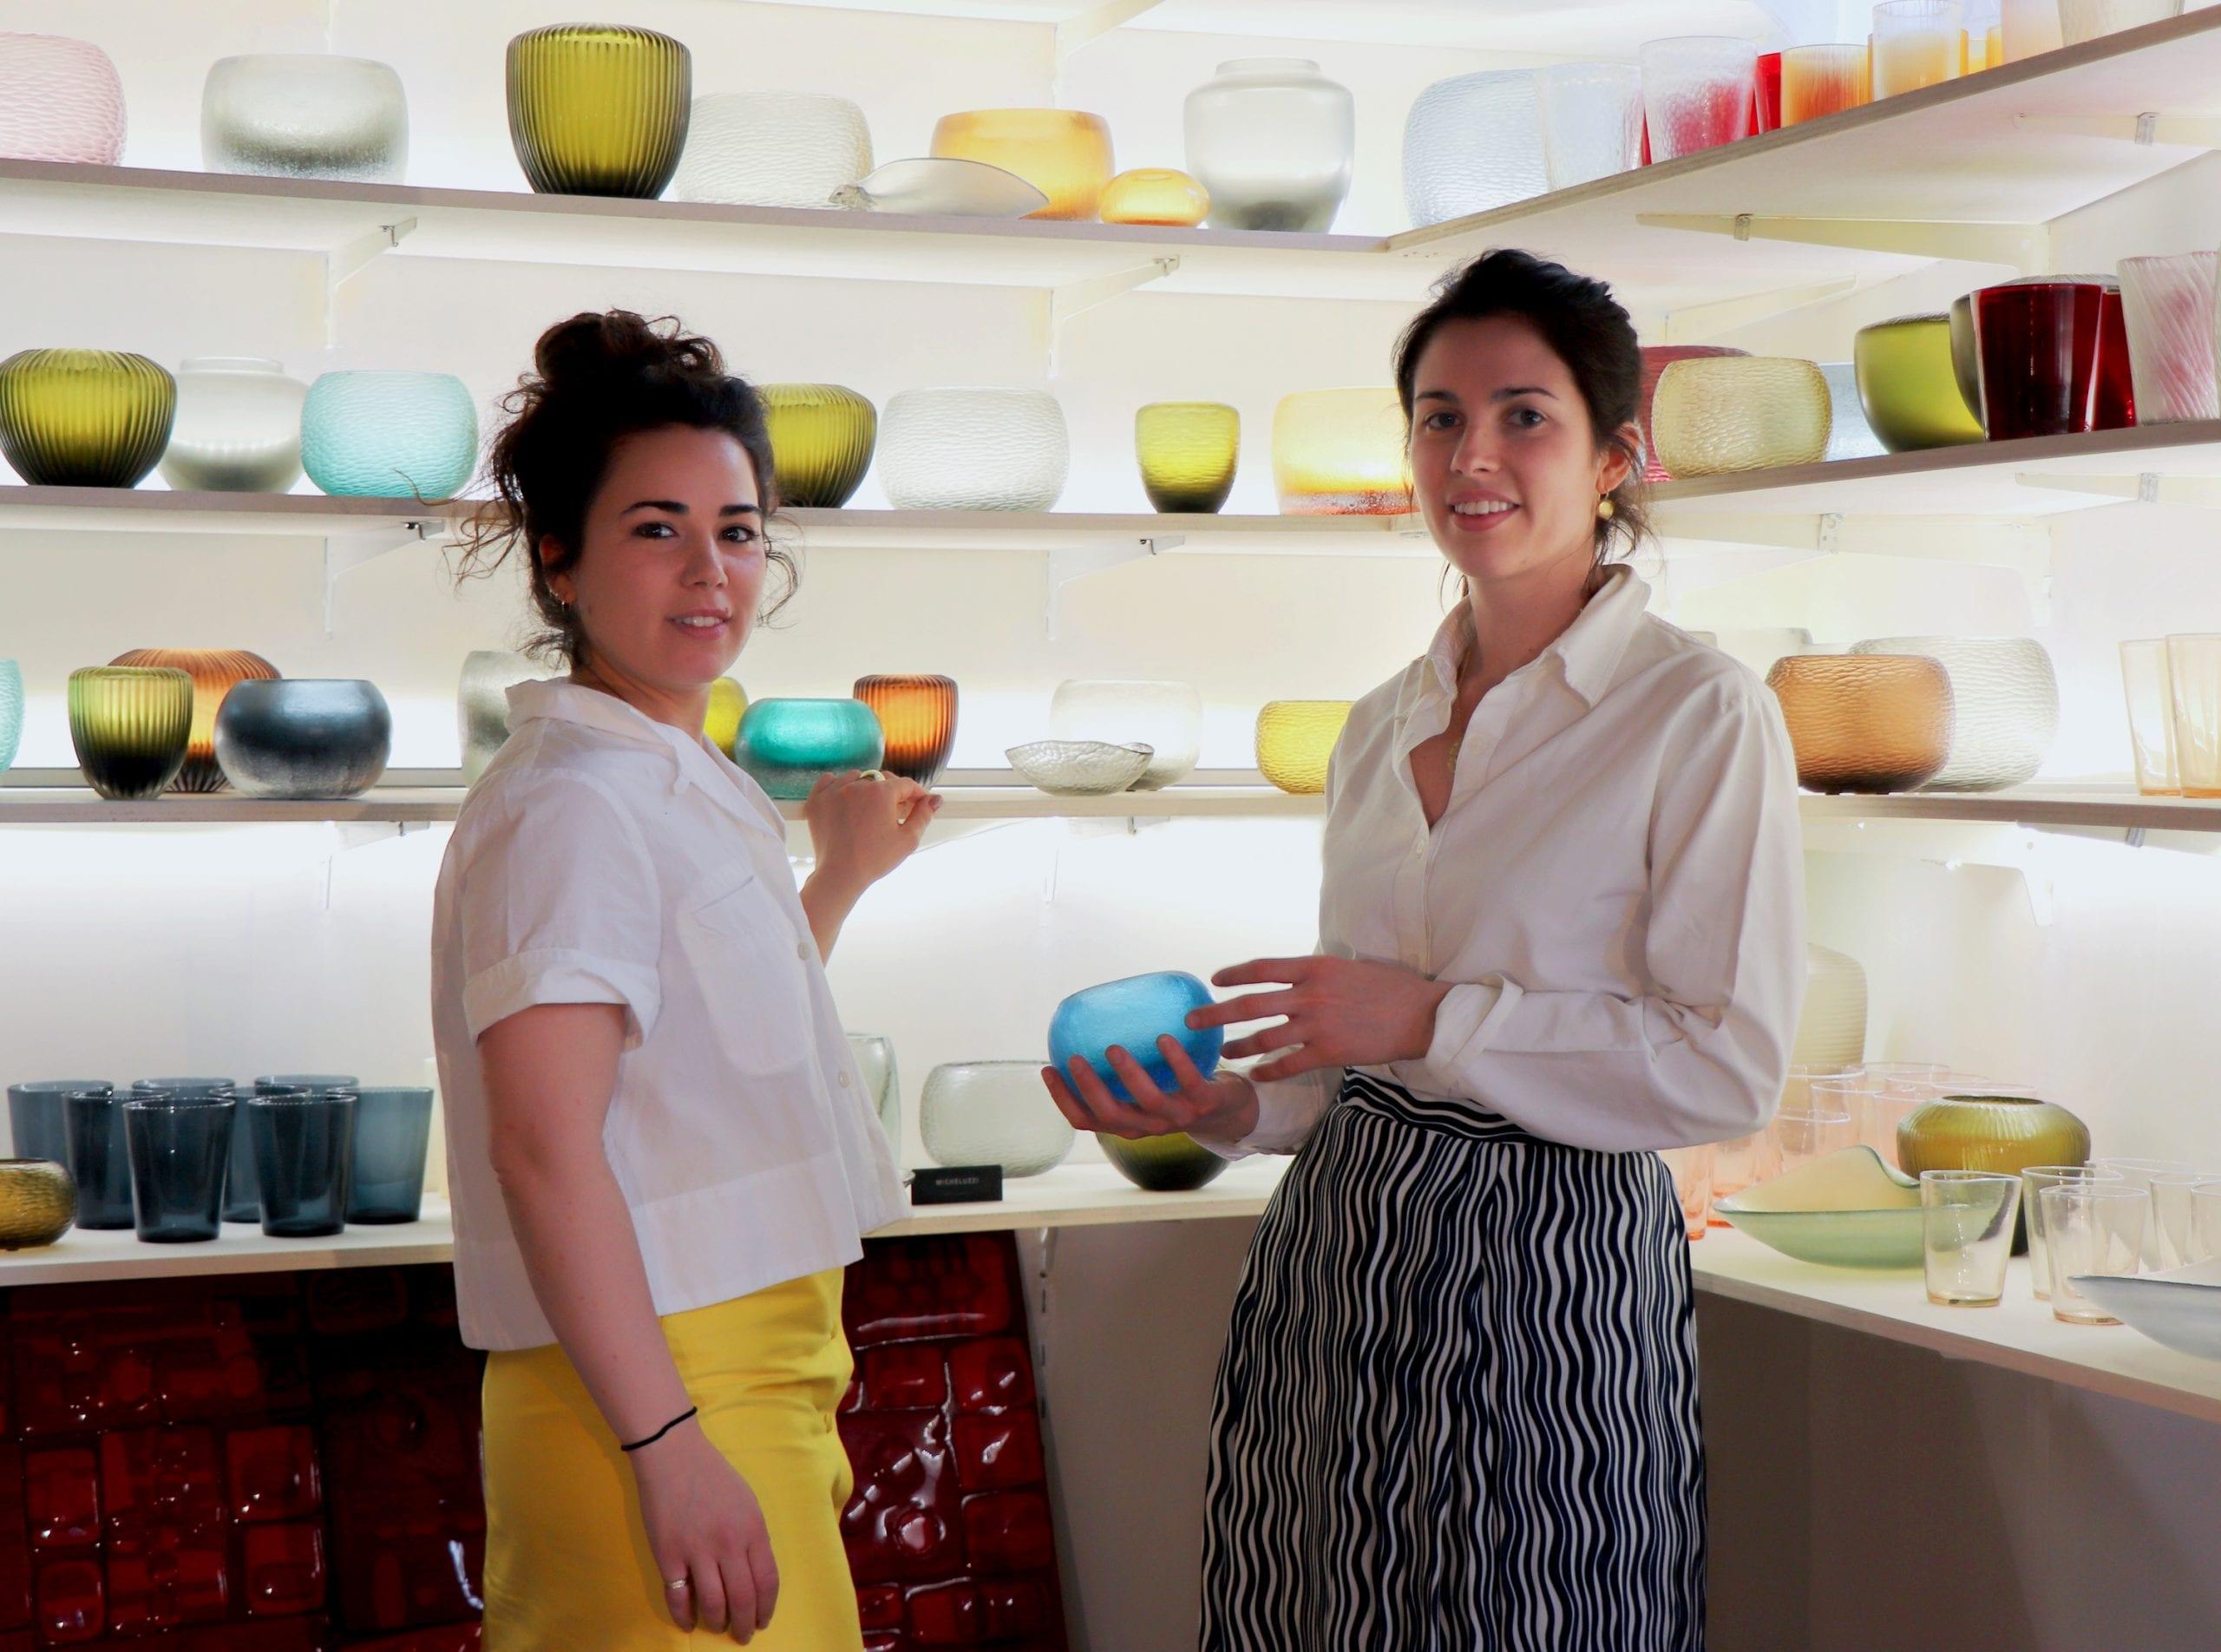 Elena e Margherita Micheluzzi - Micheluzzi Glass